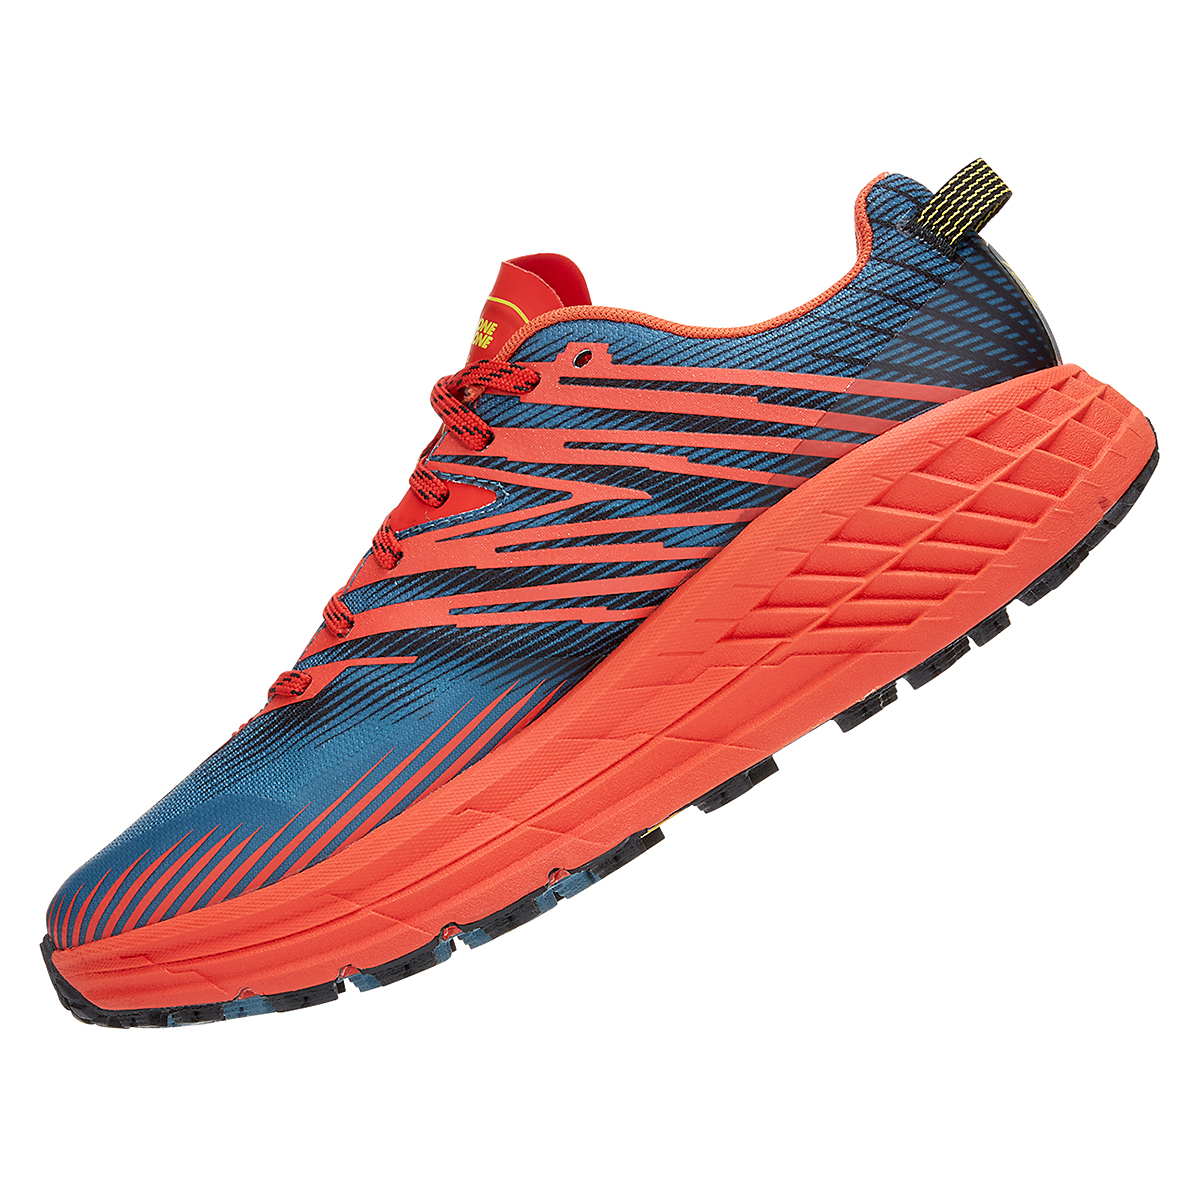 Men's Hoka One One Speedgoat 4 Trail Running Shoe, , large, image 5